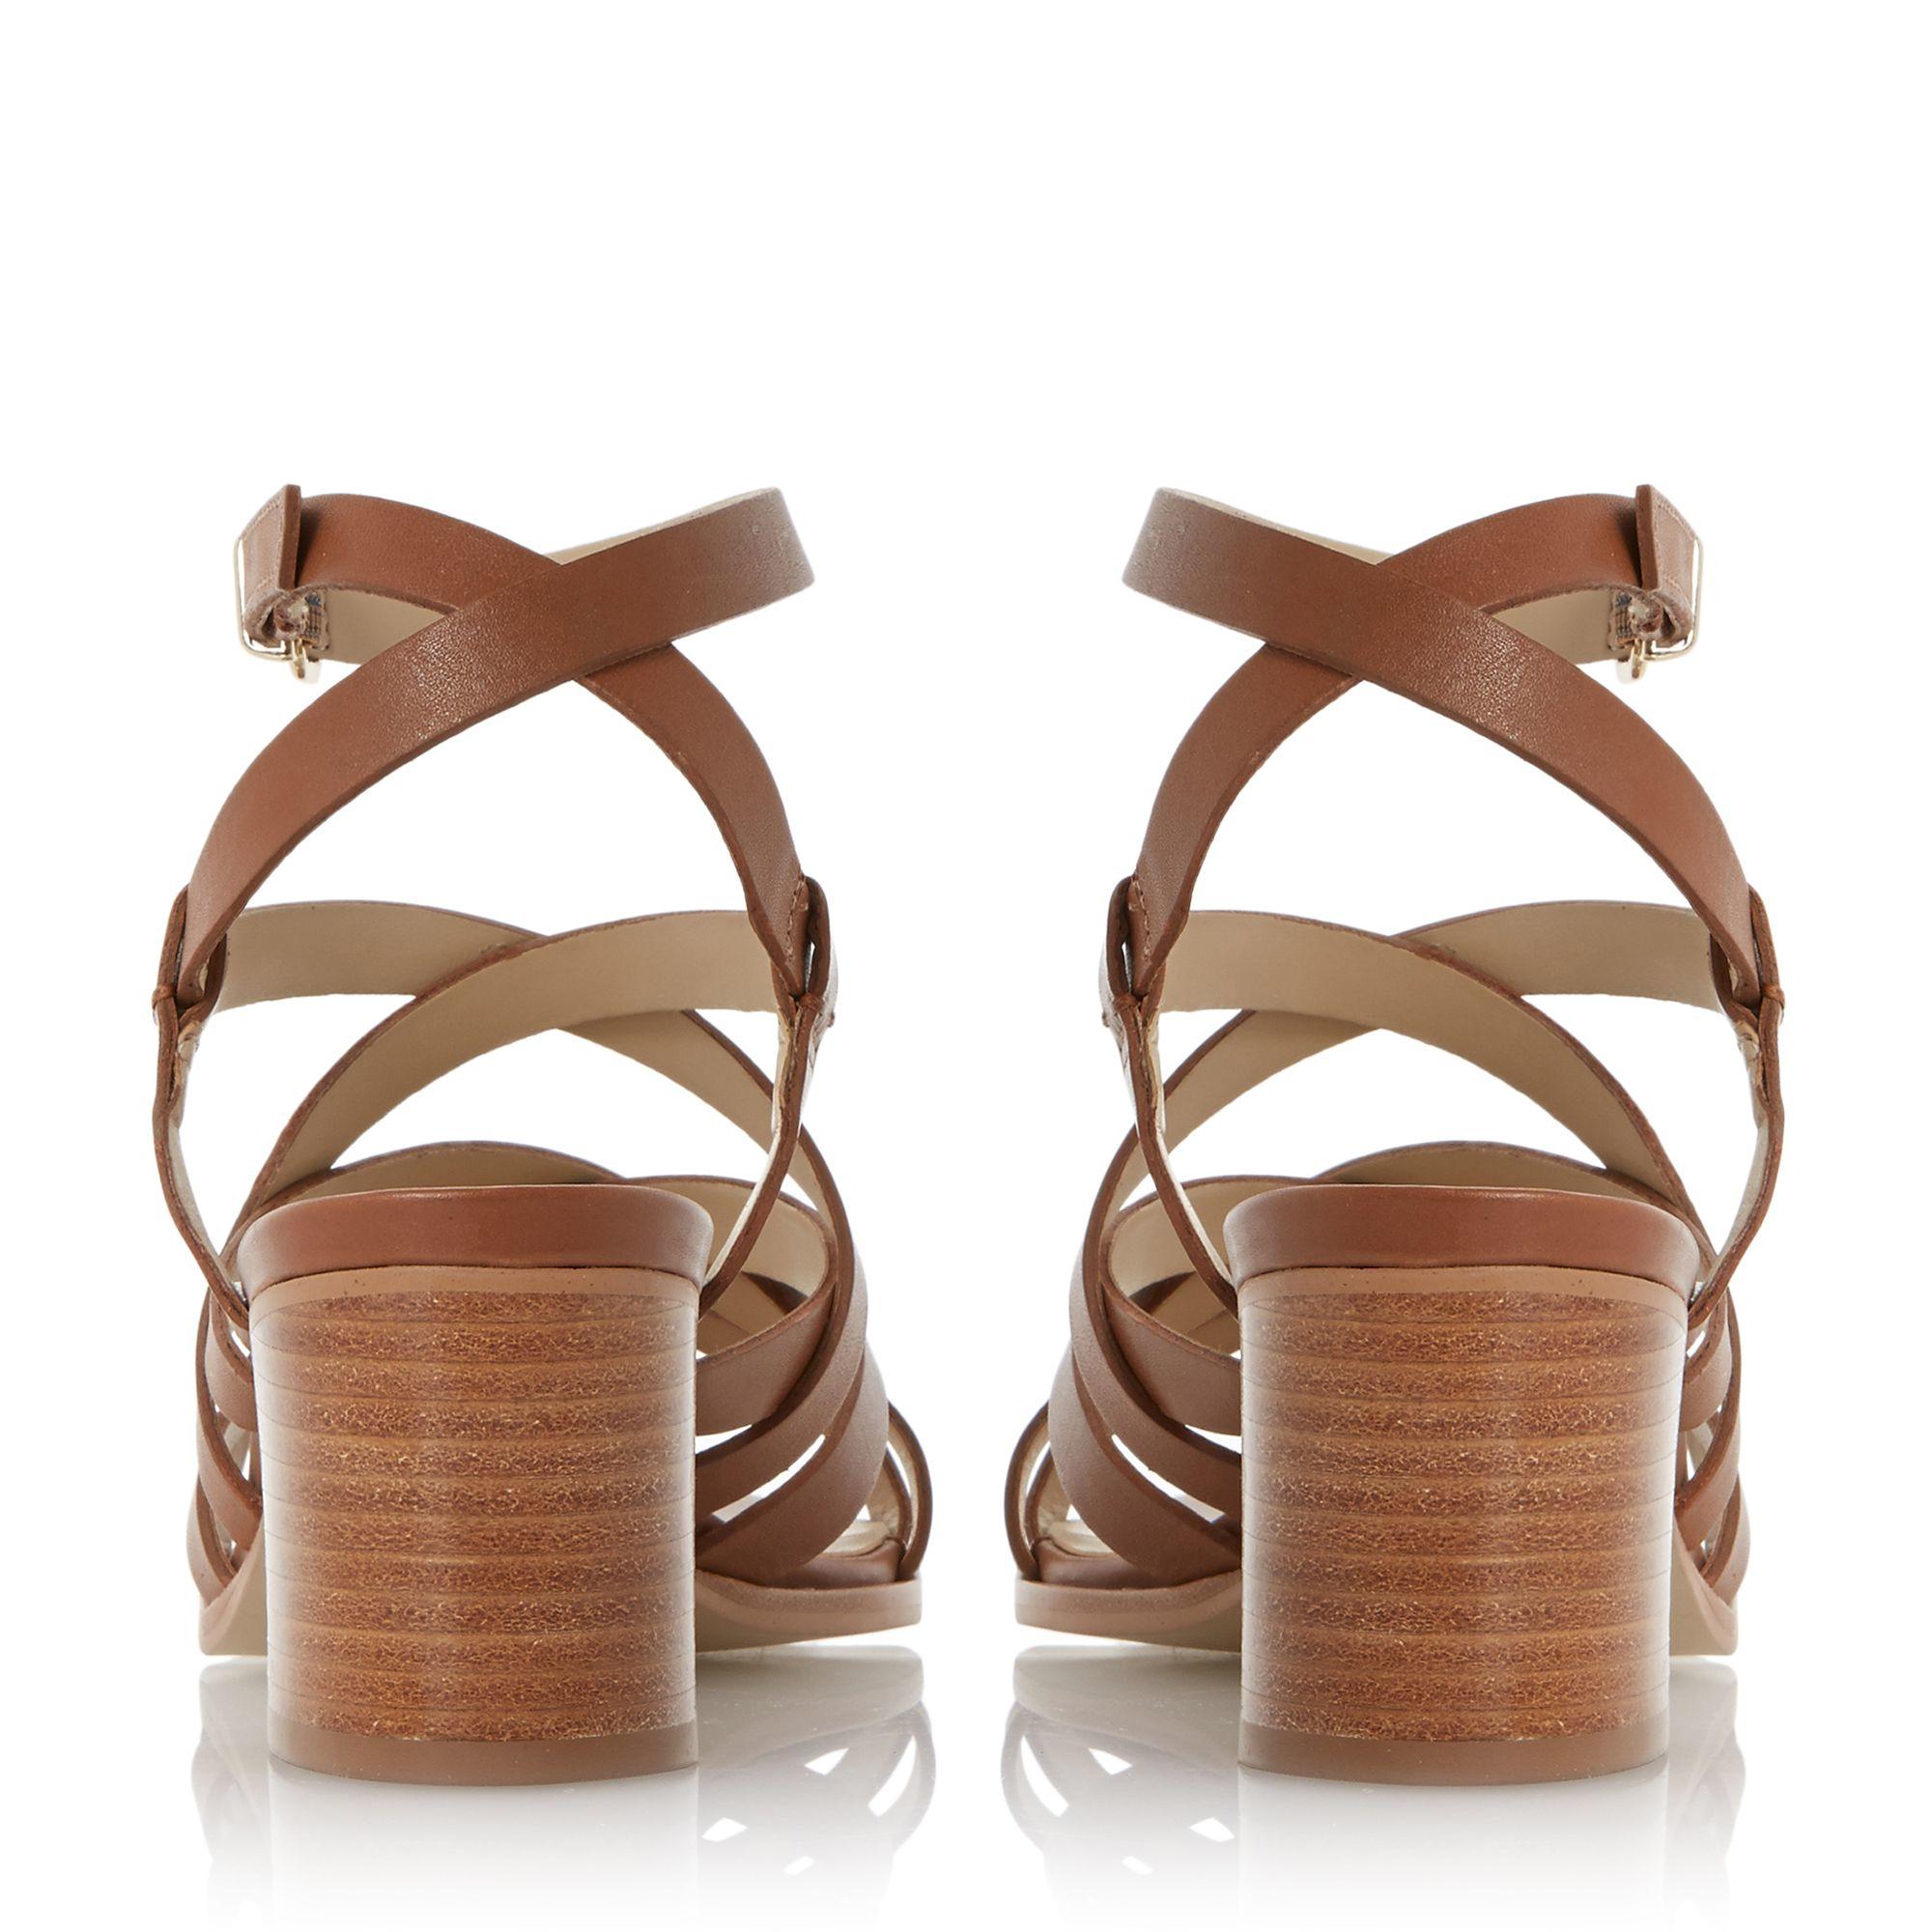 Dune Leather Iliana Strappy Block Heel Sandals In Brown Lyst